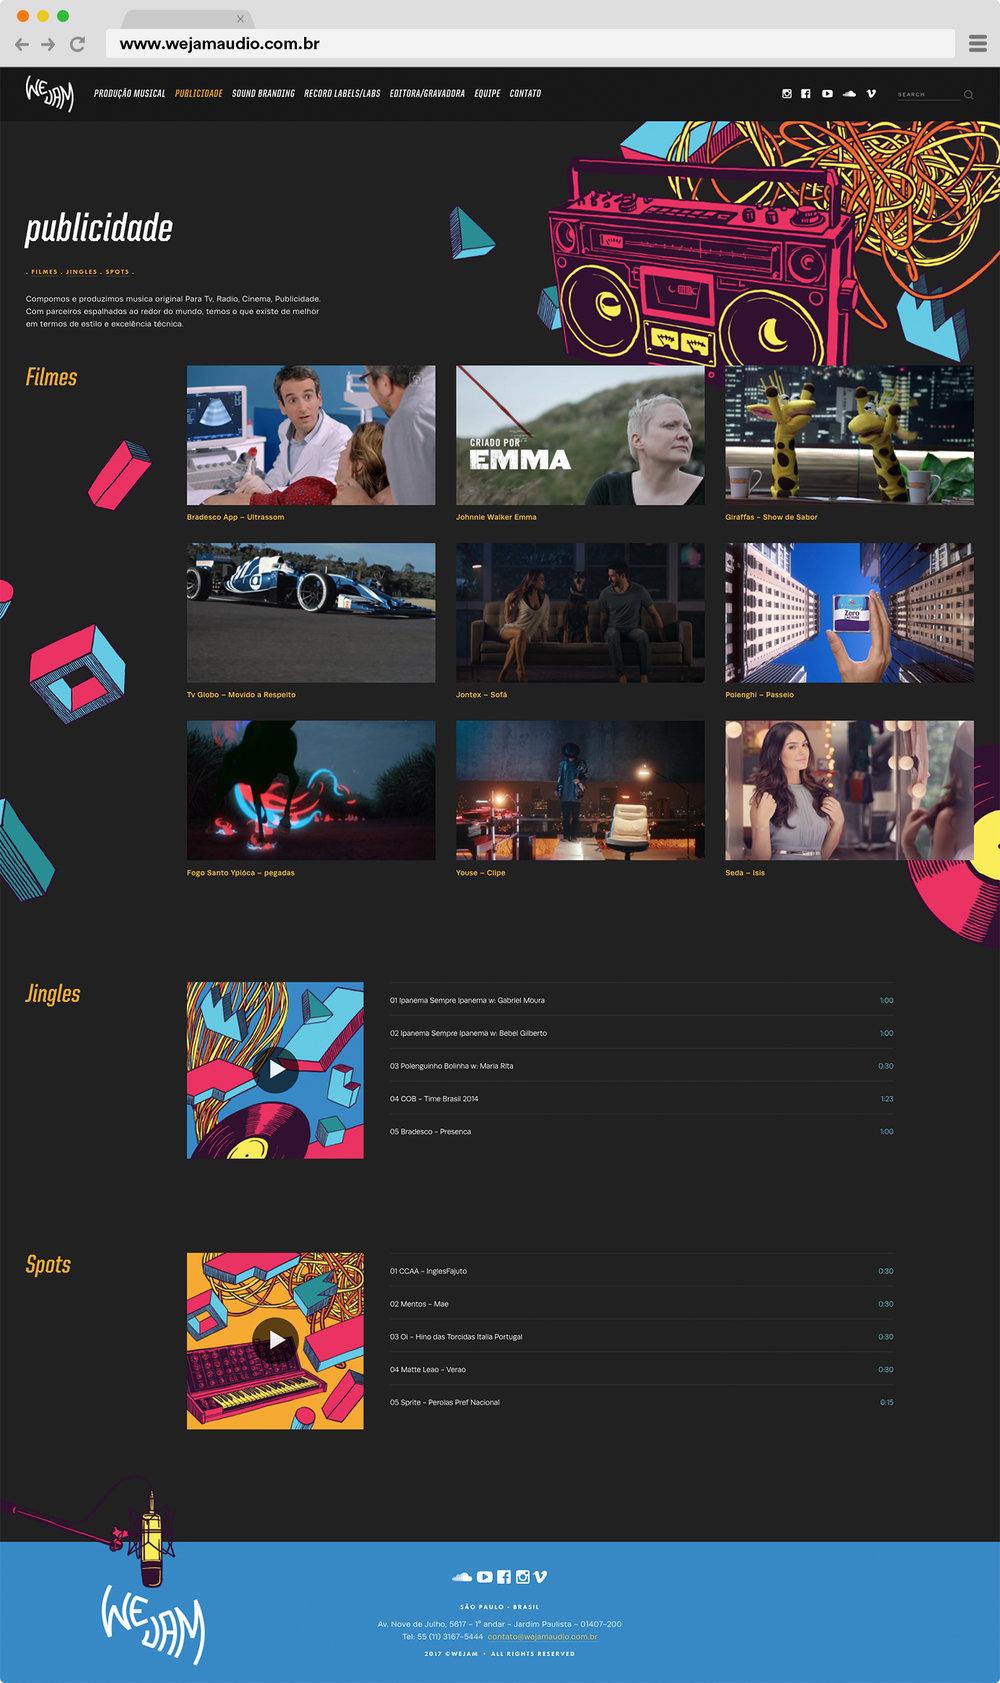 WeJam_Site1.jpg